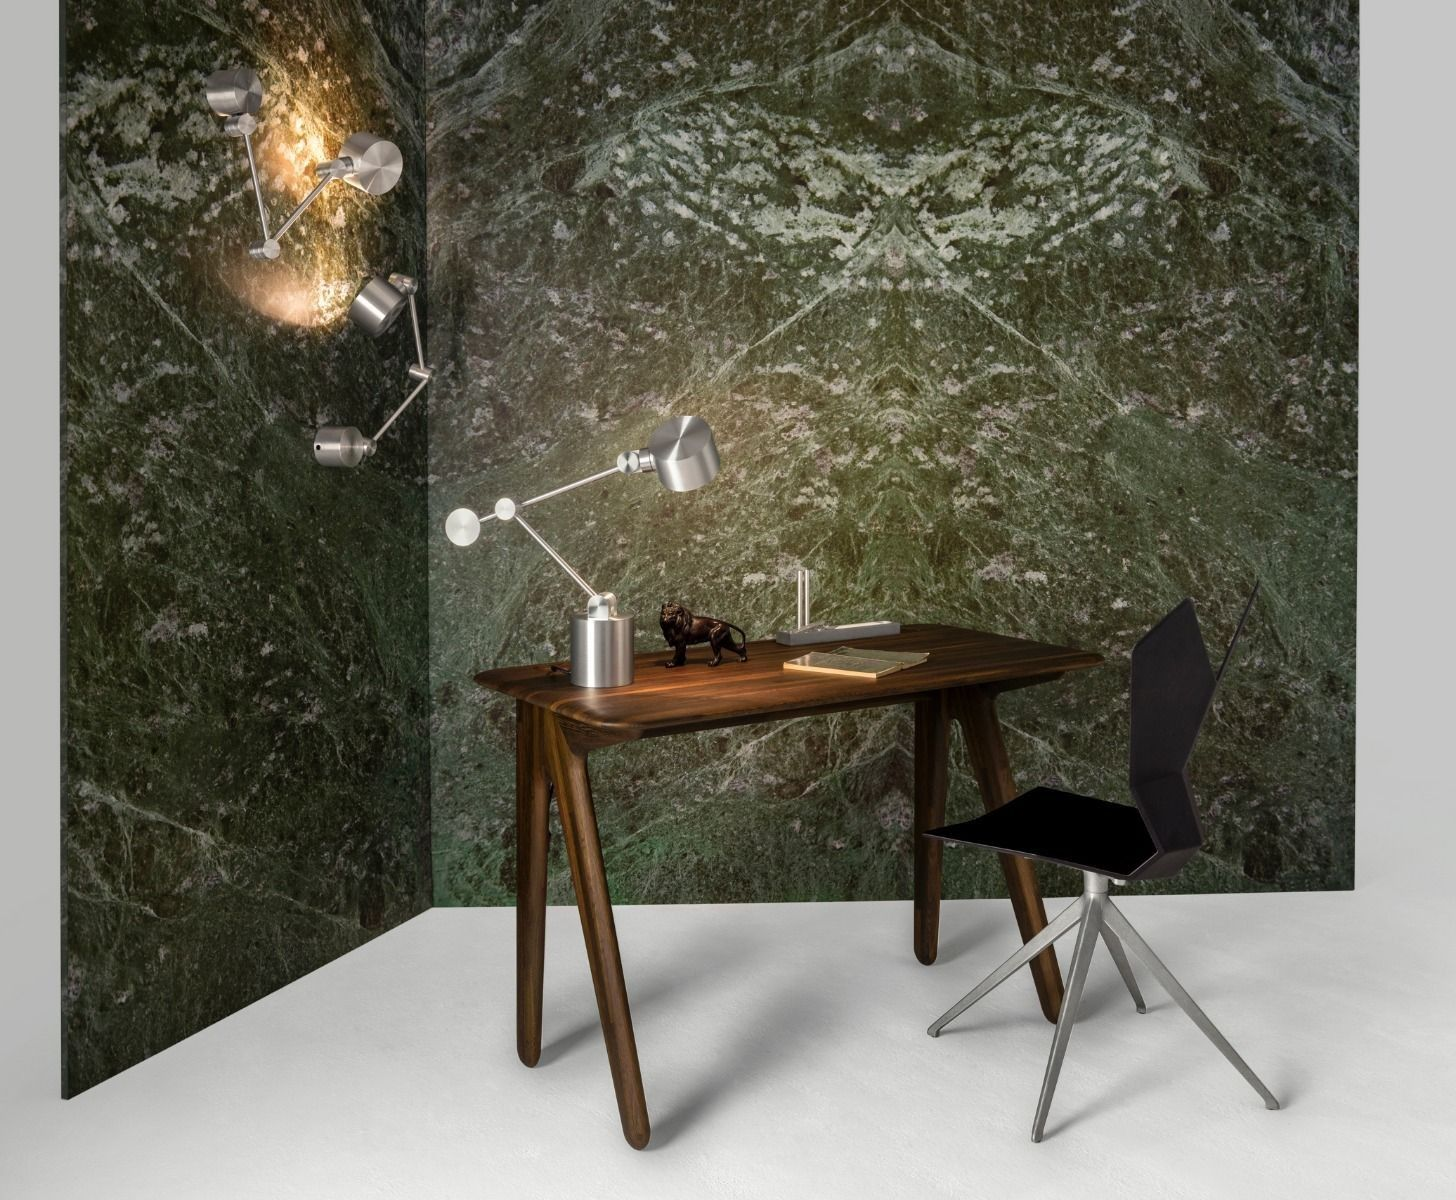 Tom Dixon Boom Wall Light Office Furniture Design Furniture Tom Dixon